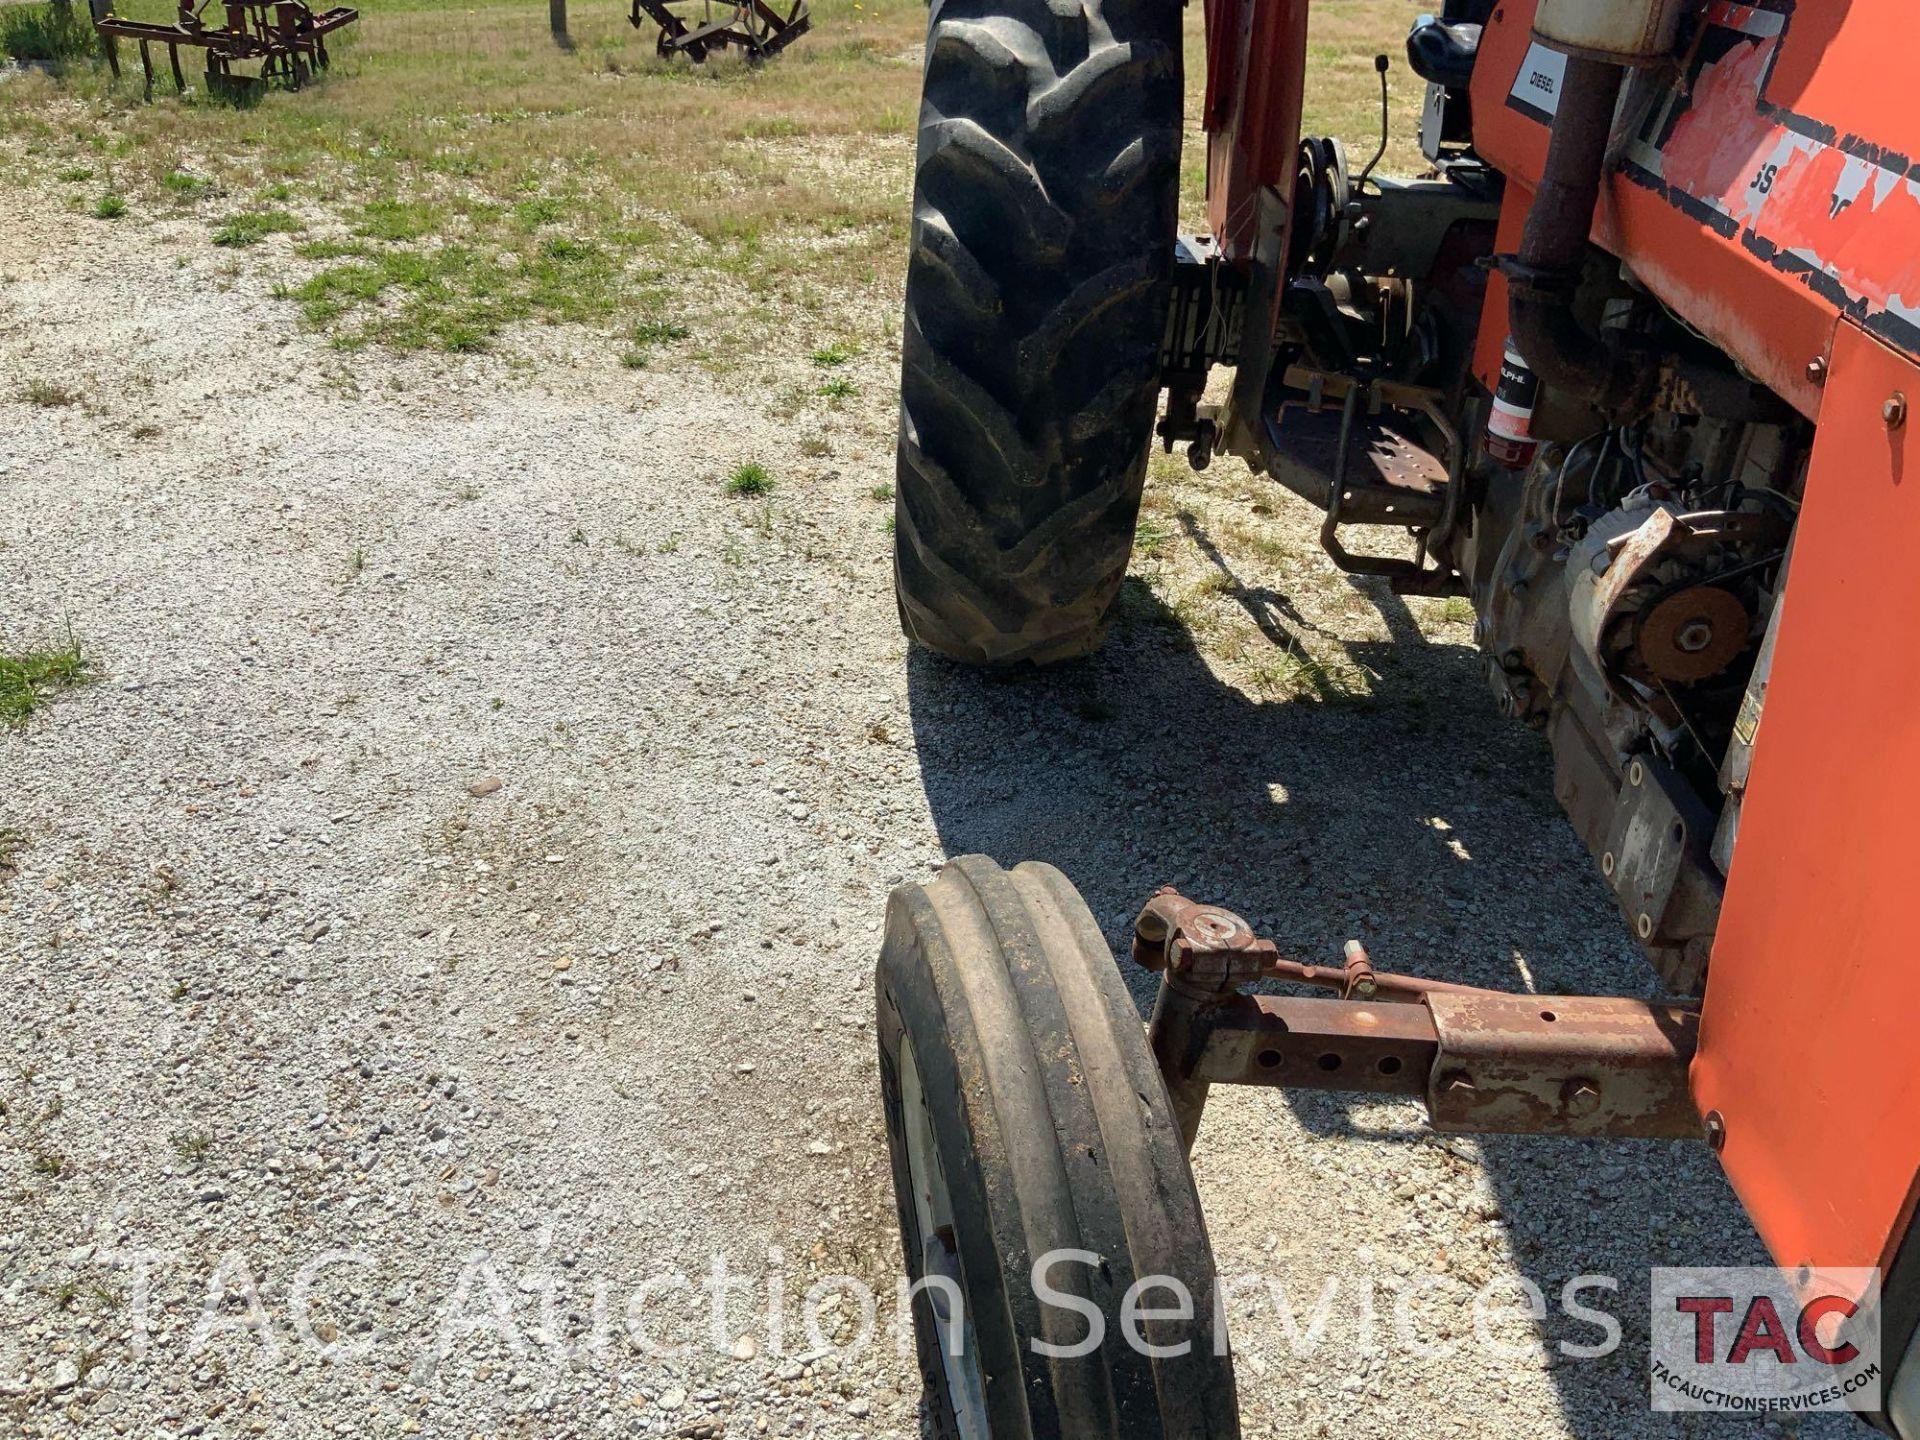 Massey Ferguson 265 FarmTractor - Image 11 of 23